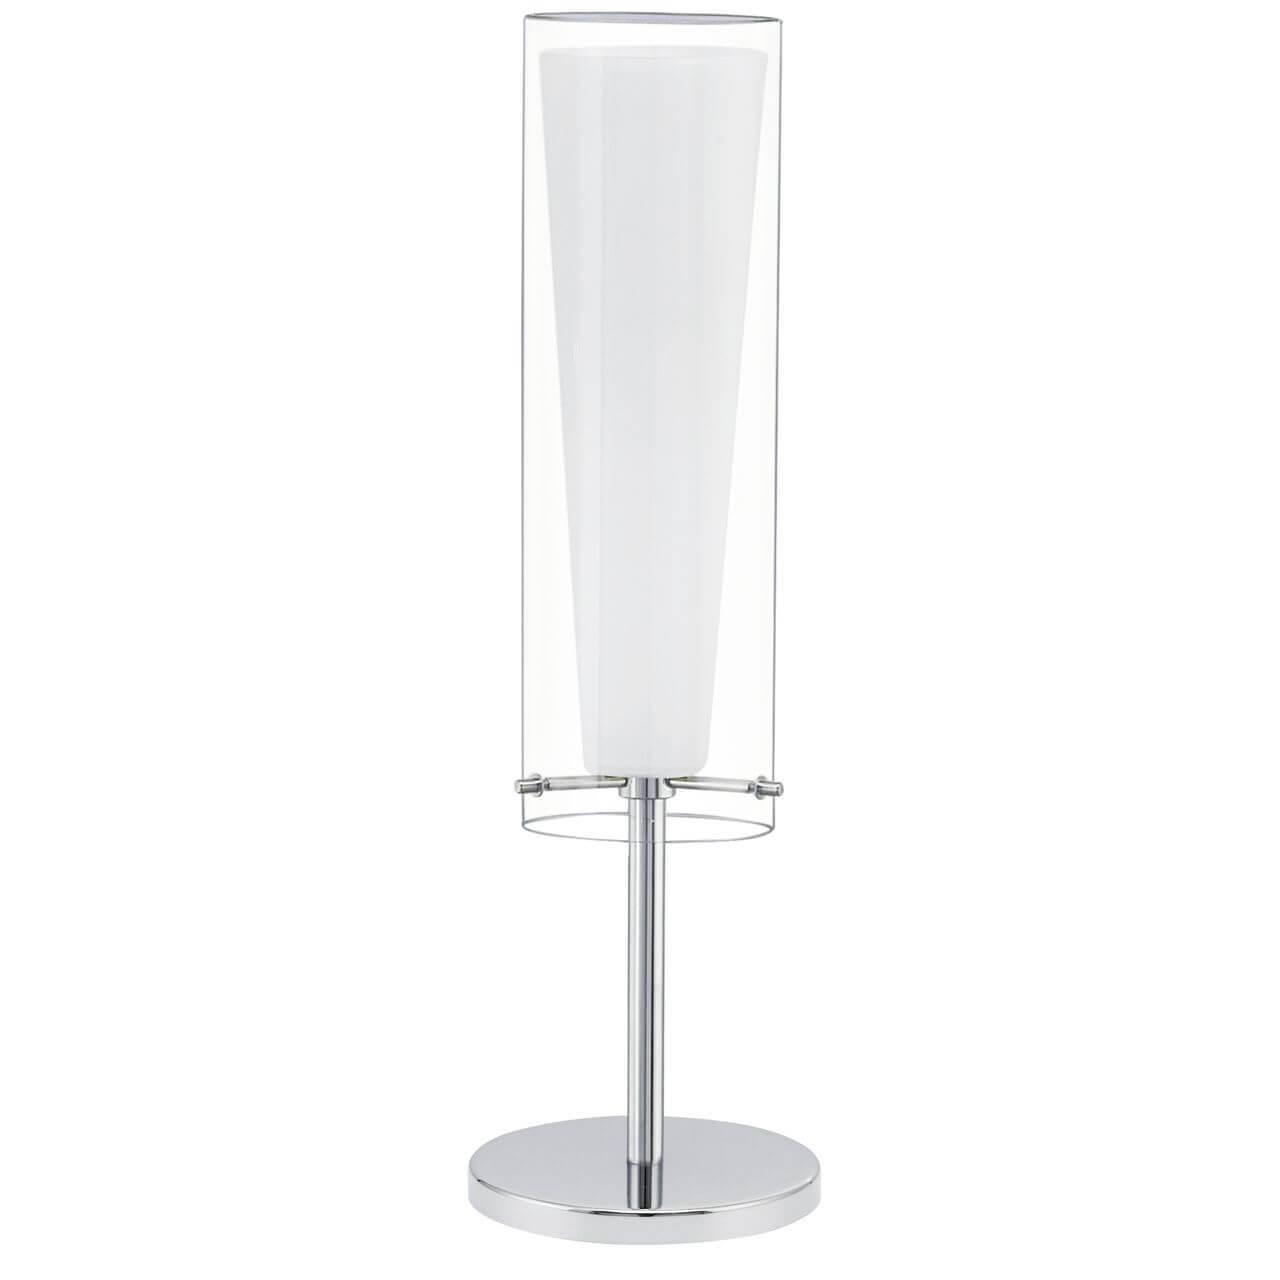 Настольная лампа Eglo Pinto 89835 цена и фото